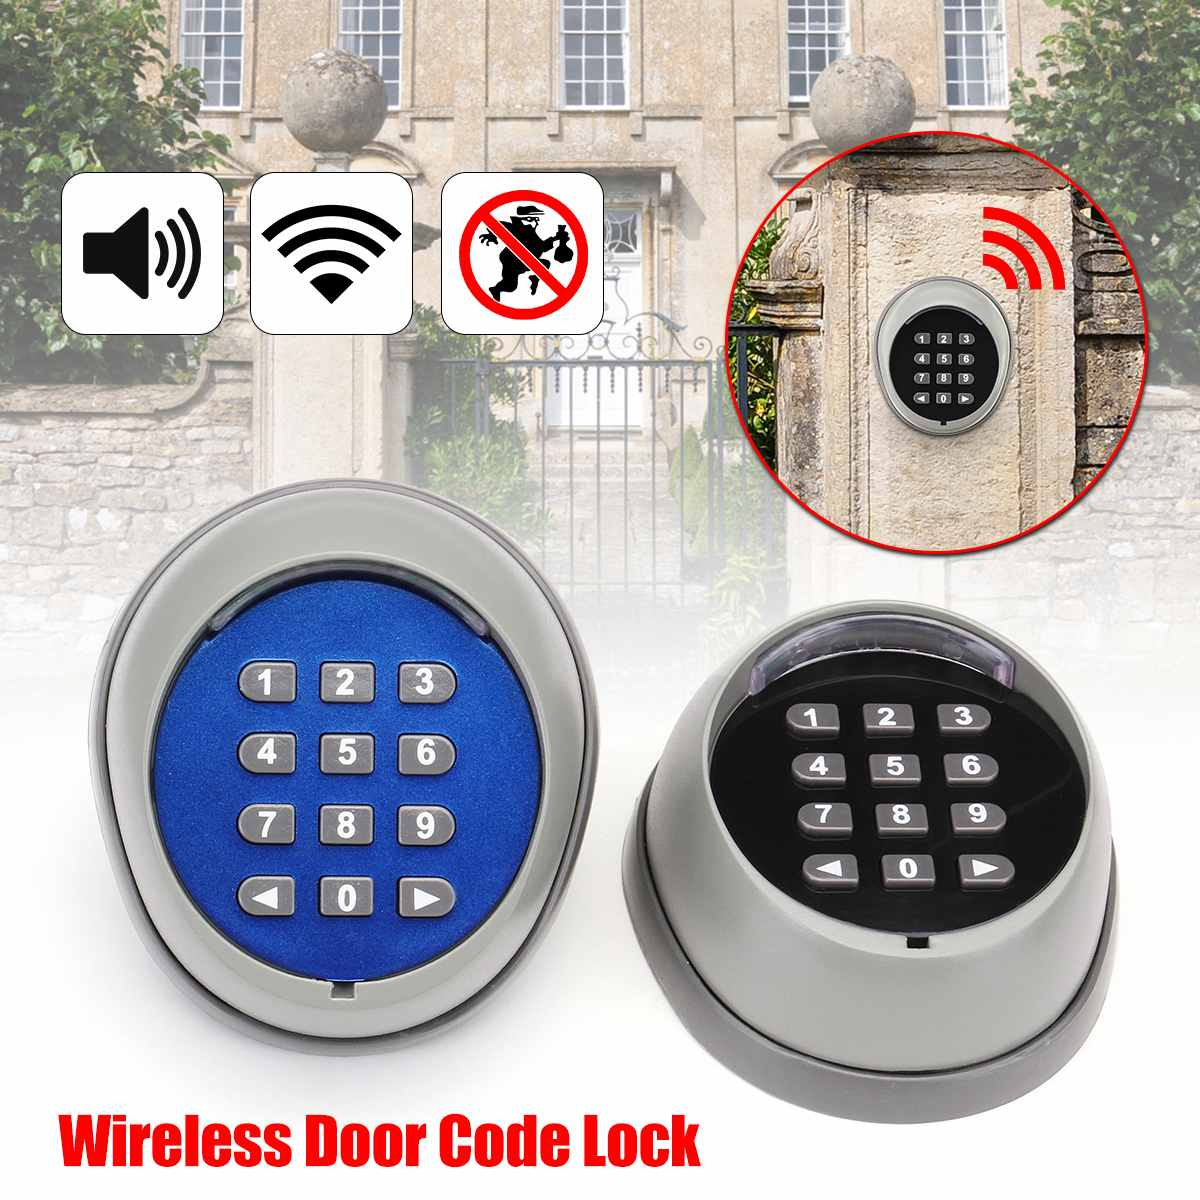 1PCS Black/Blue Door Lock Access Control Wireless Keypad password switch kit for gate door MOTOR access remote control